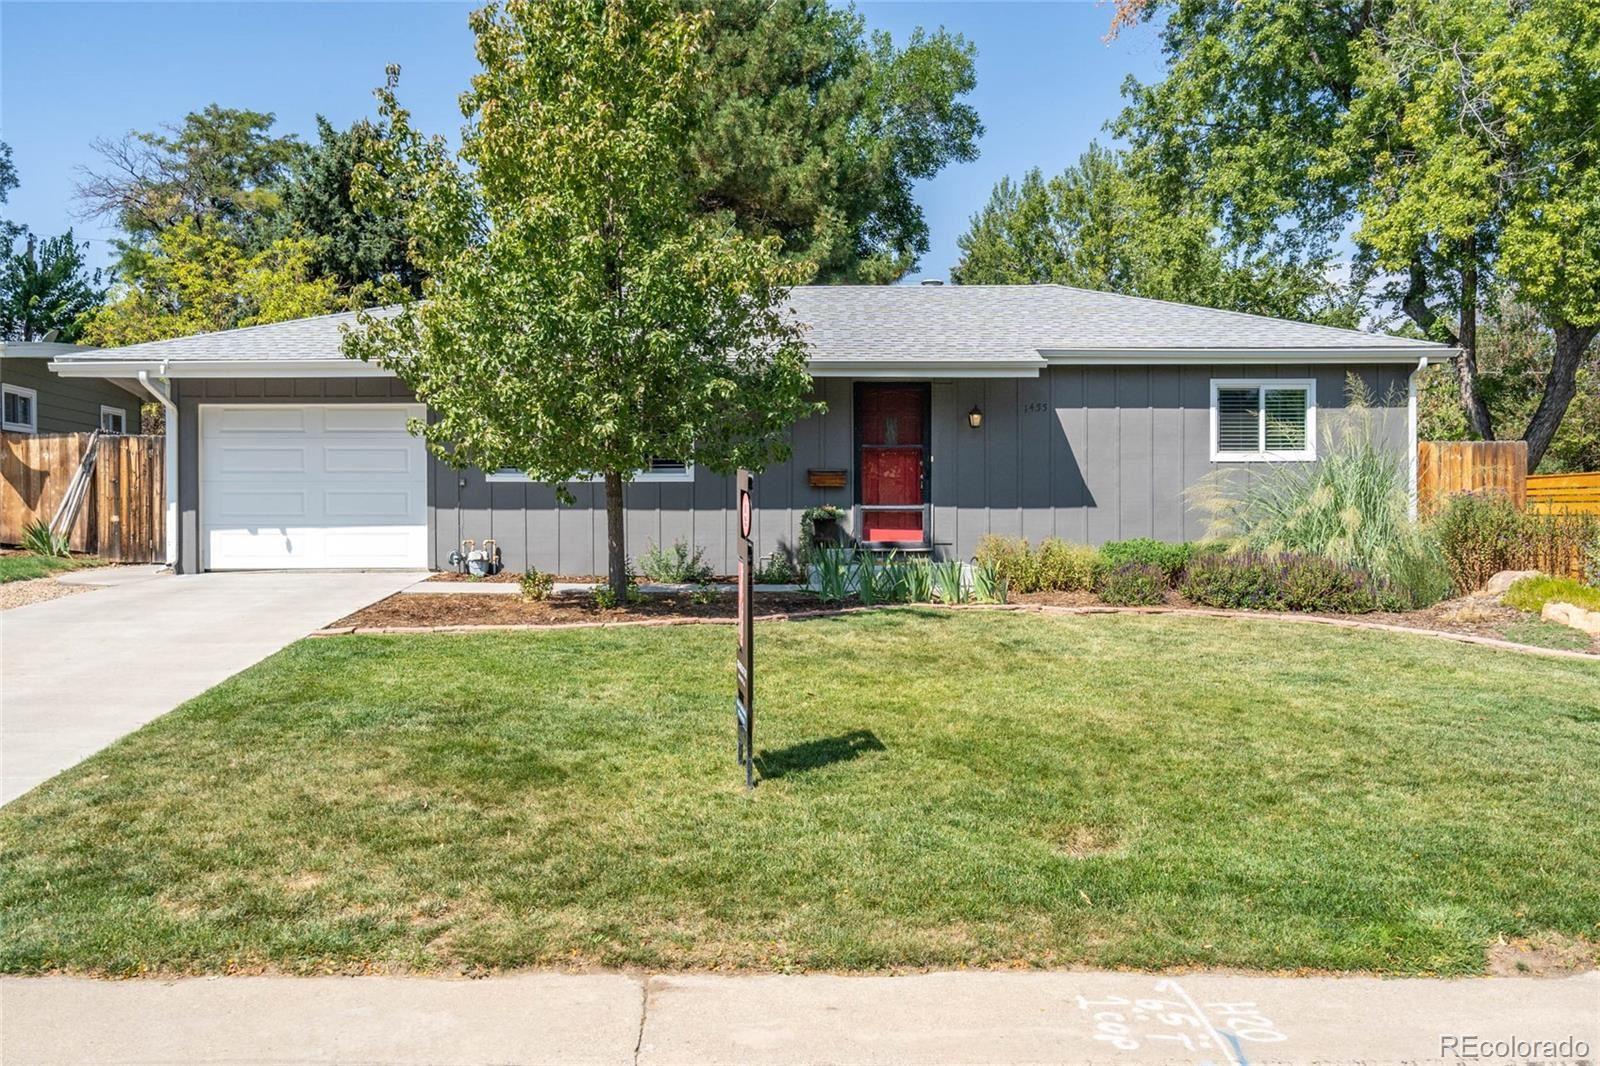 1455 S Grape Street, Denver, CO 80222 - #: 9444955